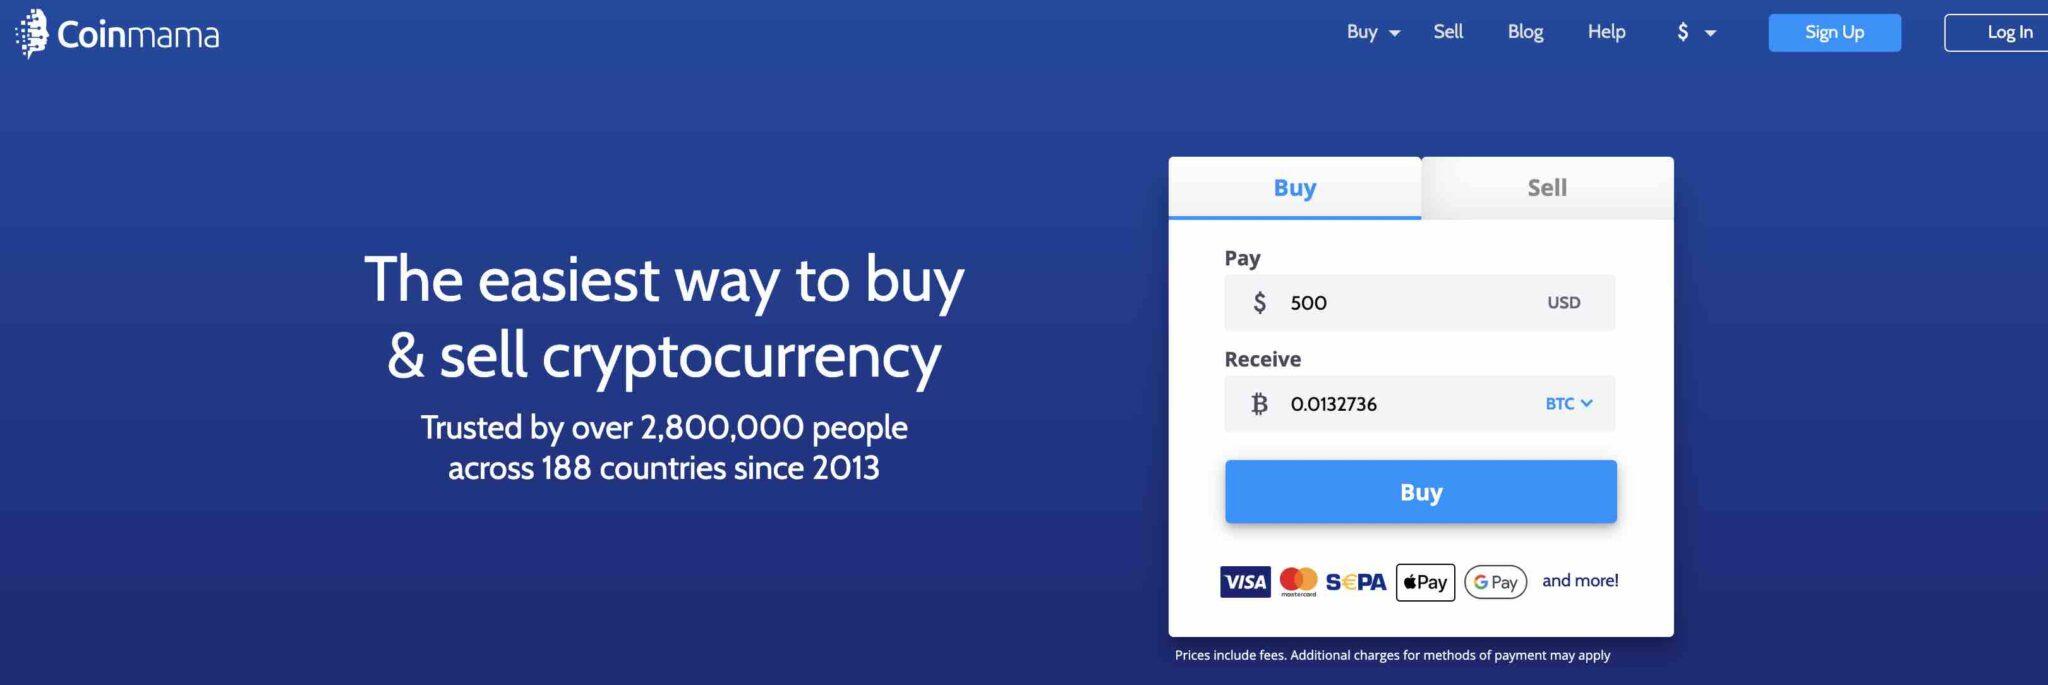 Coinmama - To Buy Sell Bitcoins